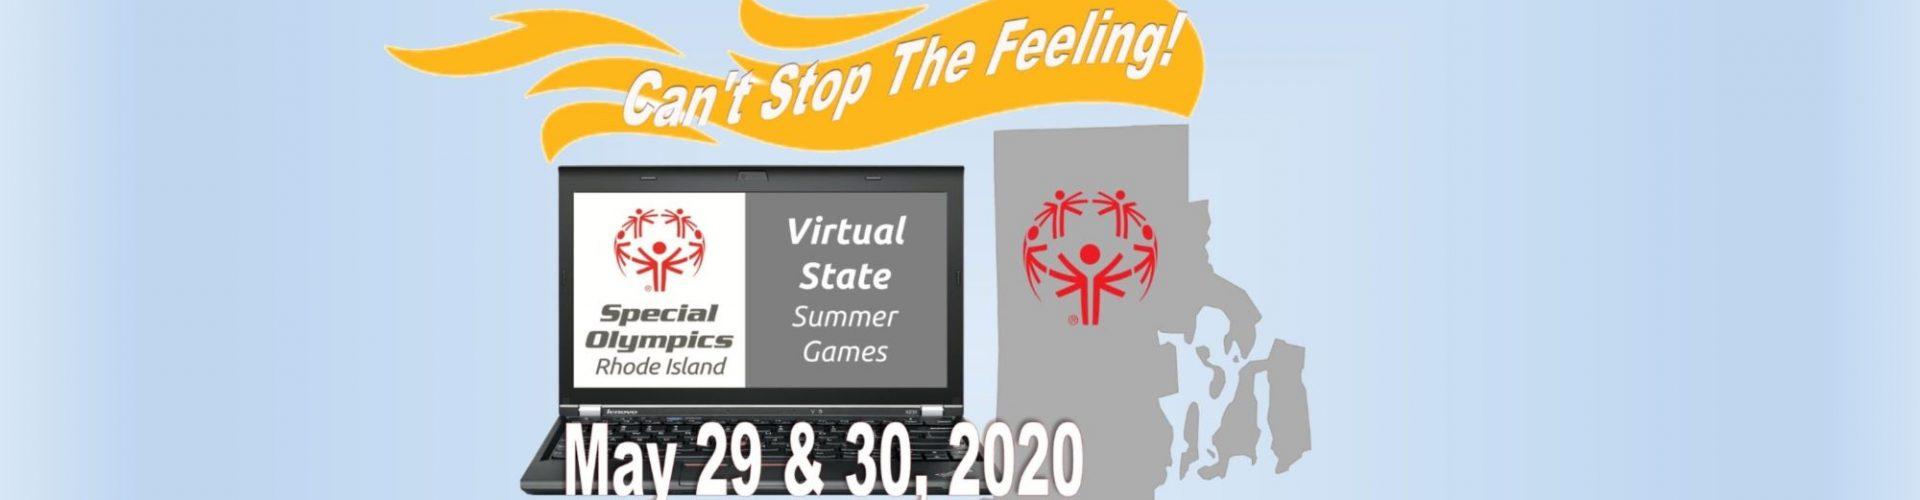 VirtualGamesPageImage